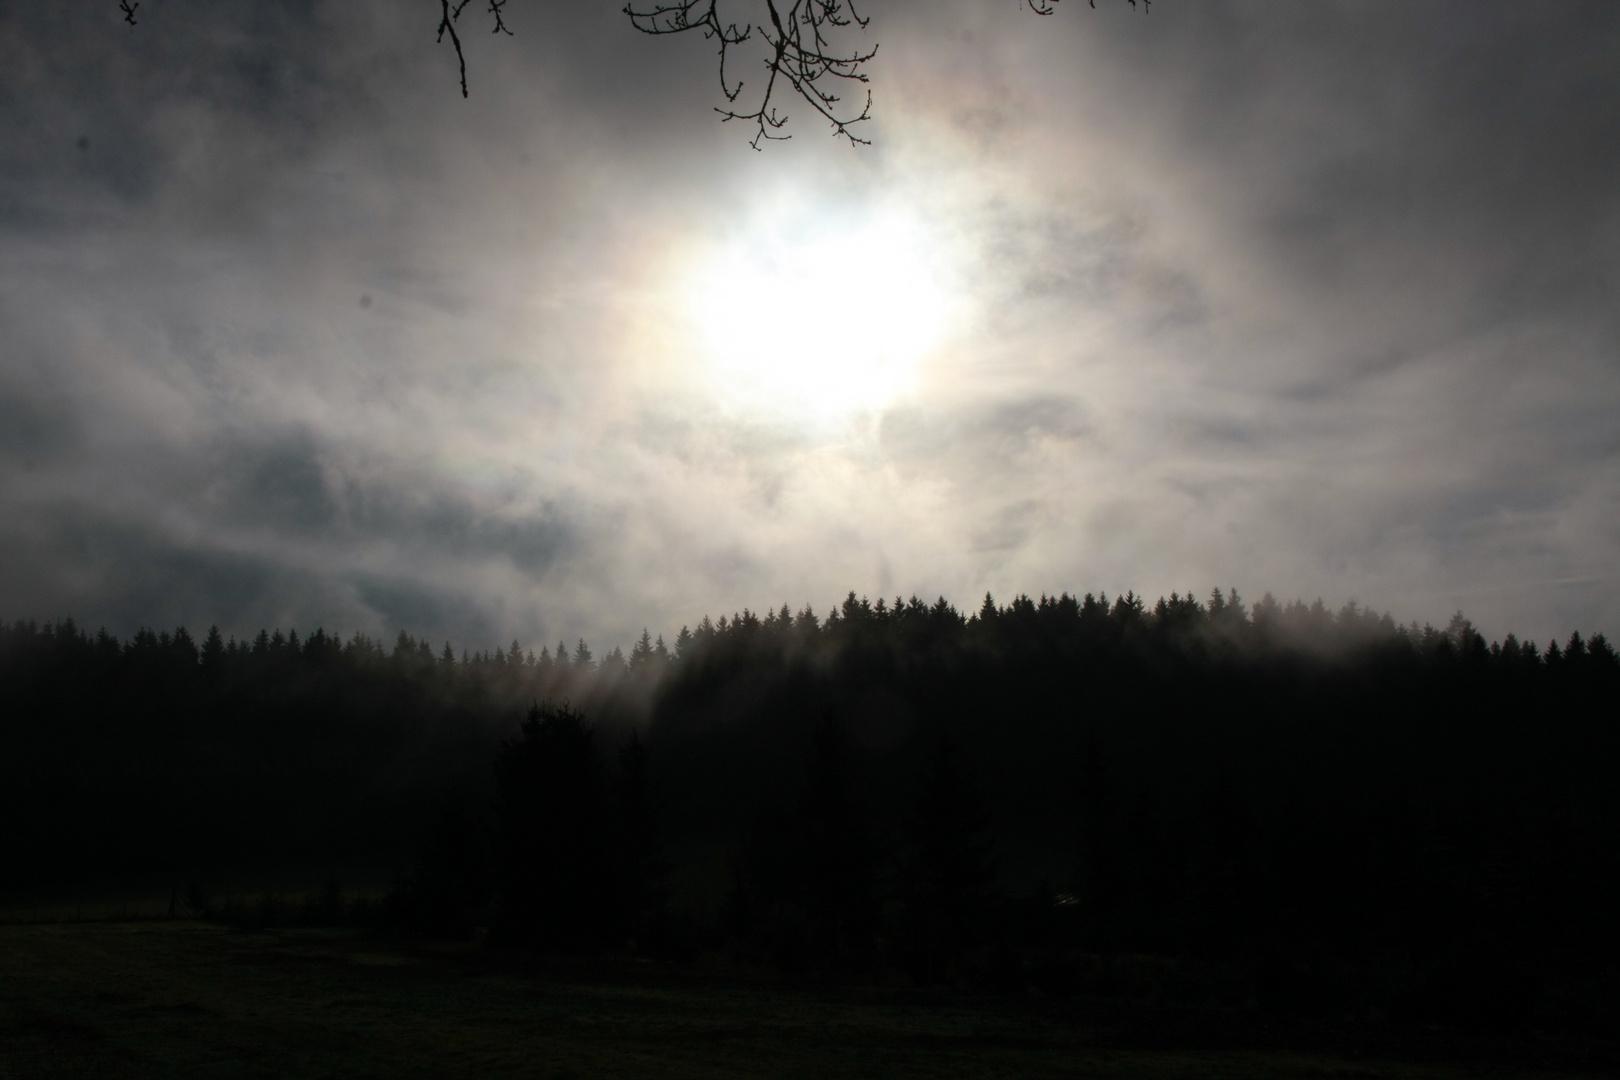 Sonne vs. Hochnebel